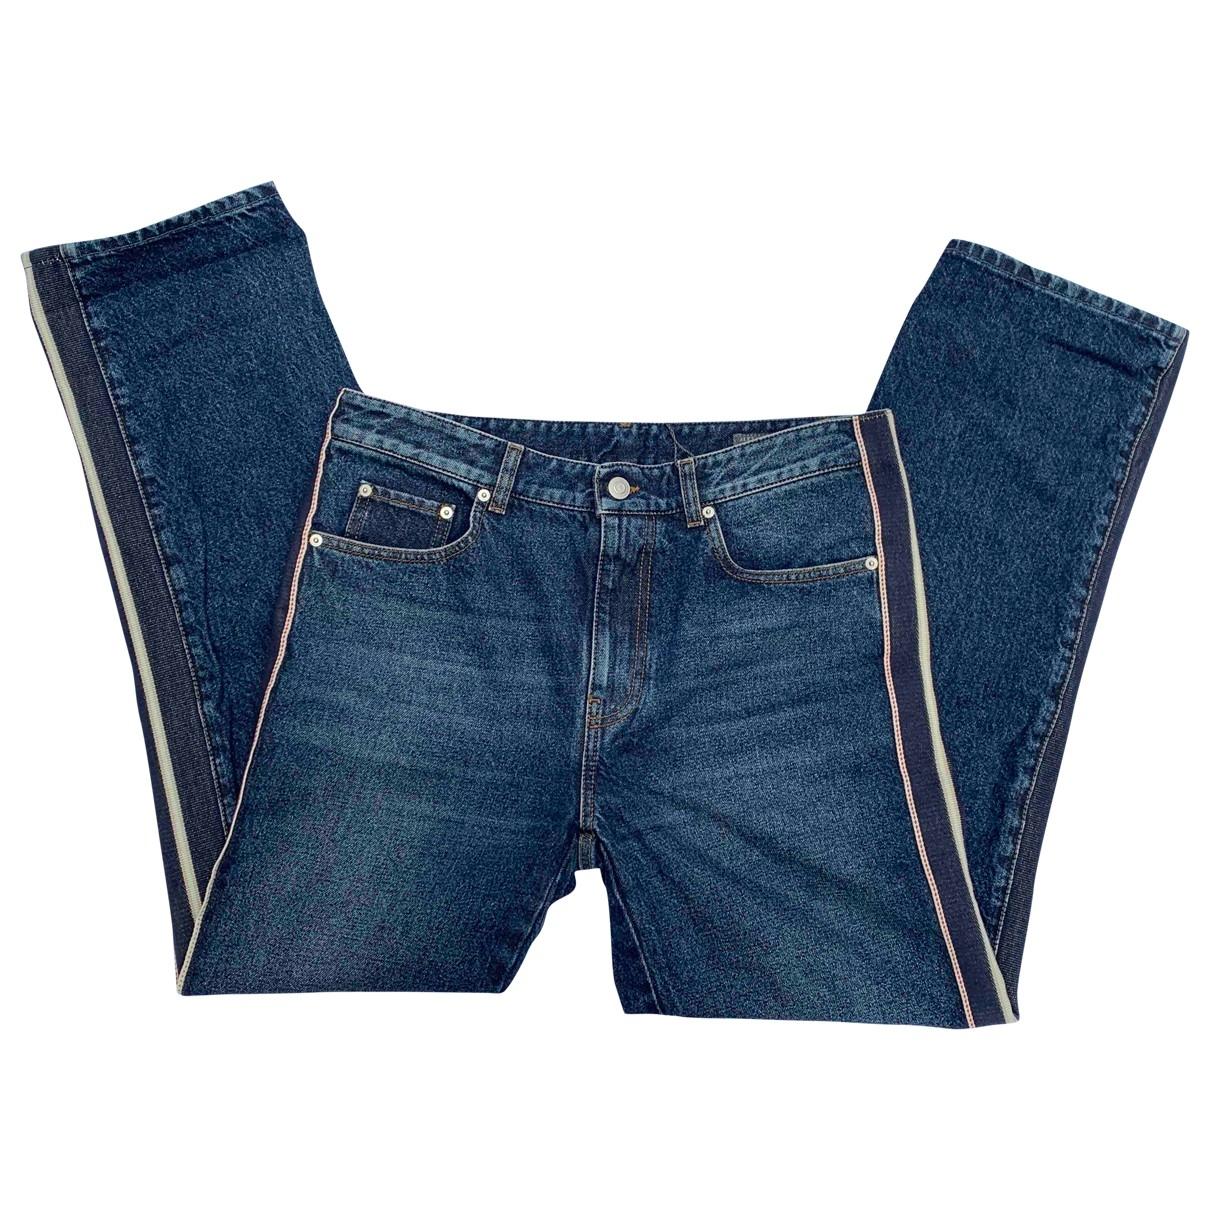 Alexander Mcqueen \N Blue Denim - Jeans Jeans for Women 38 FR